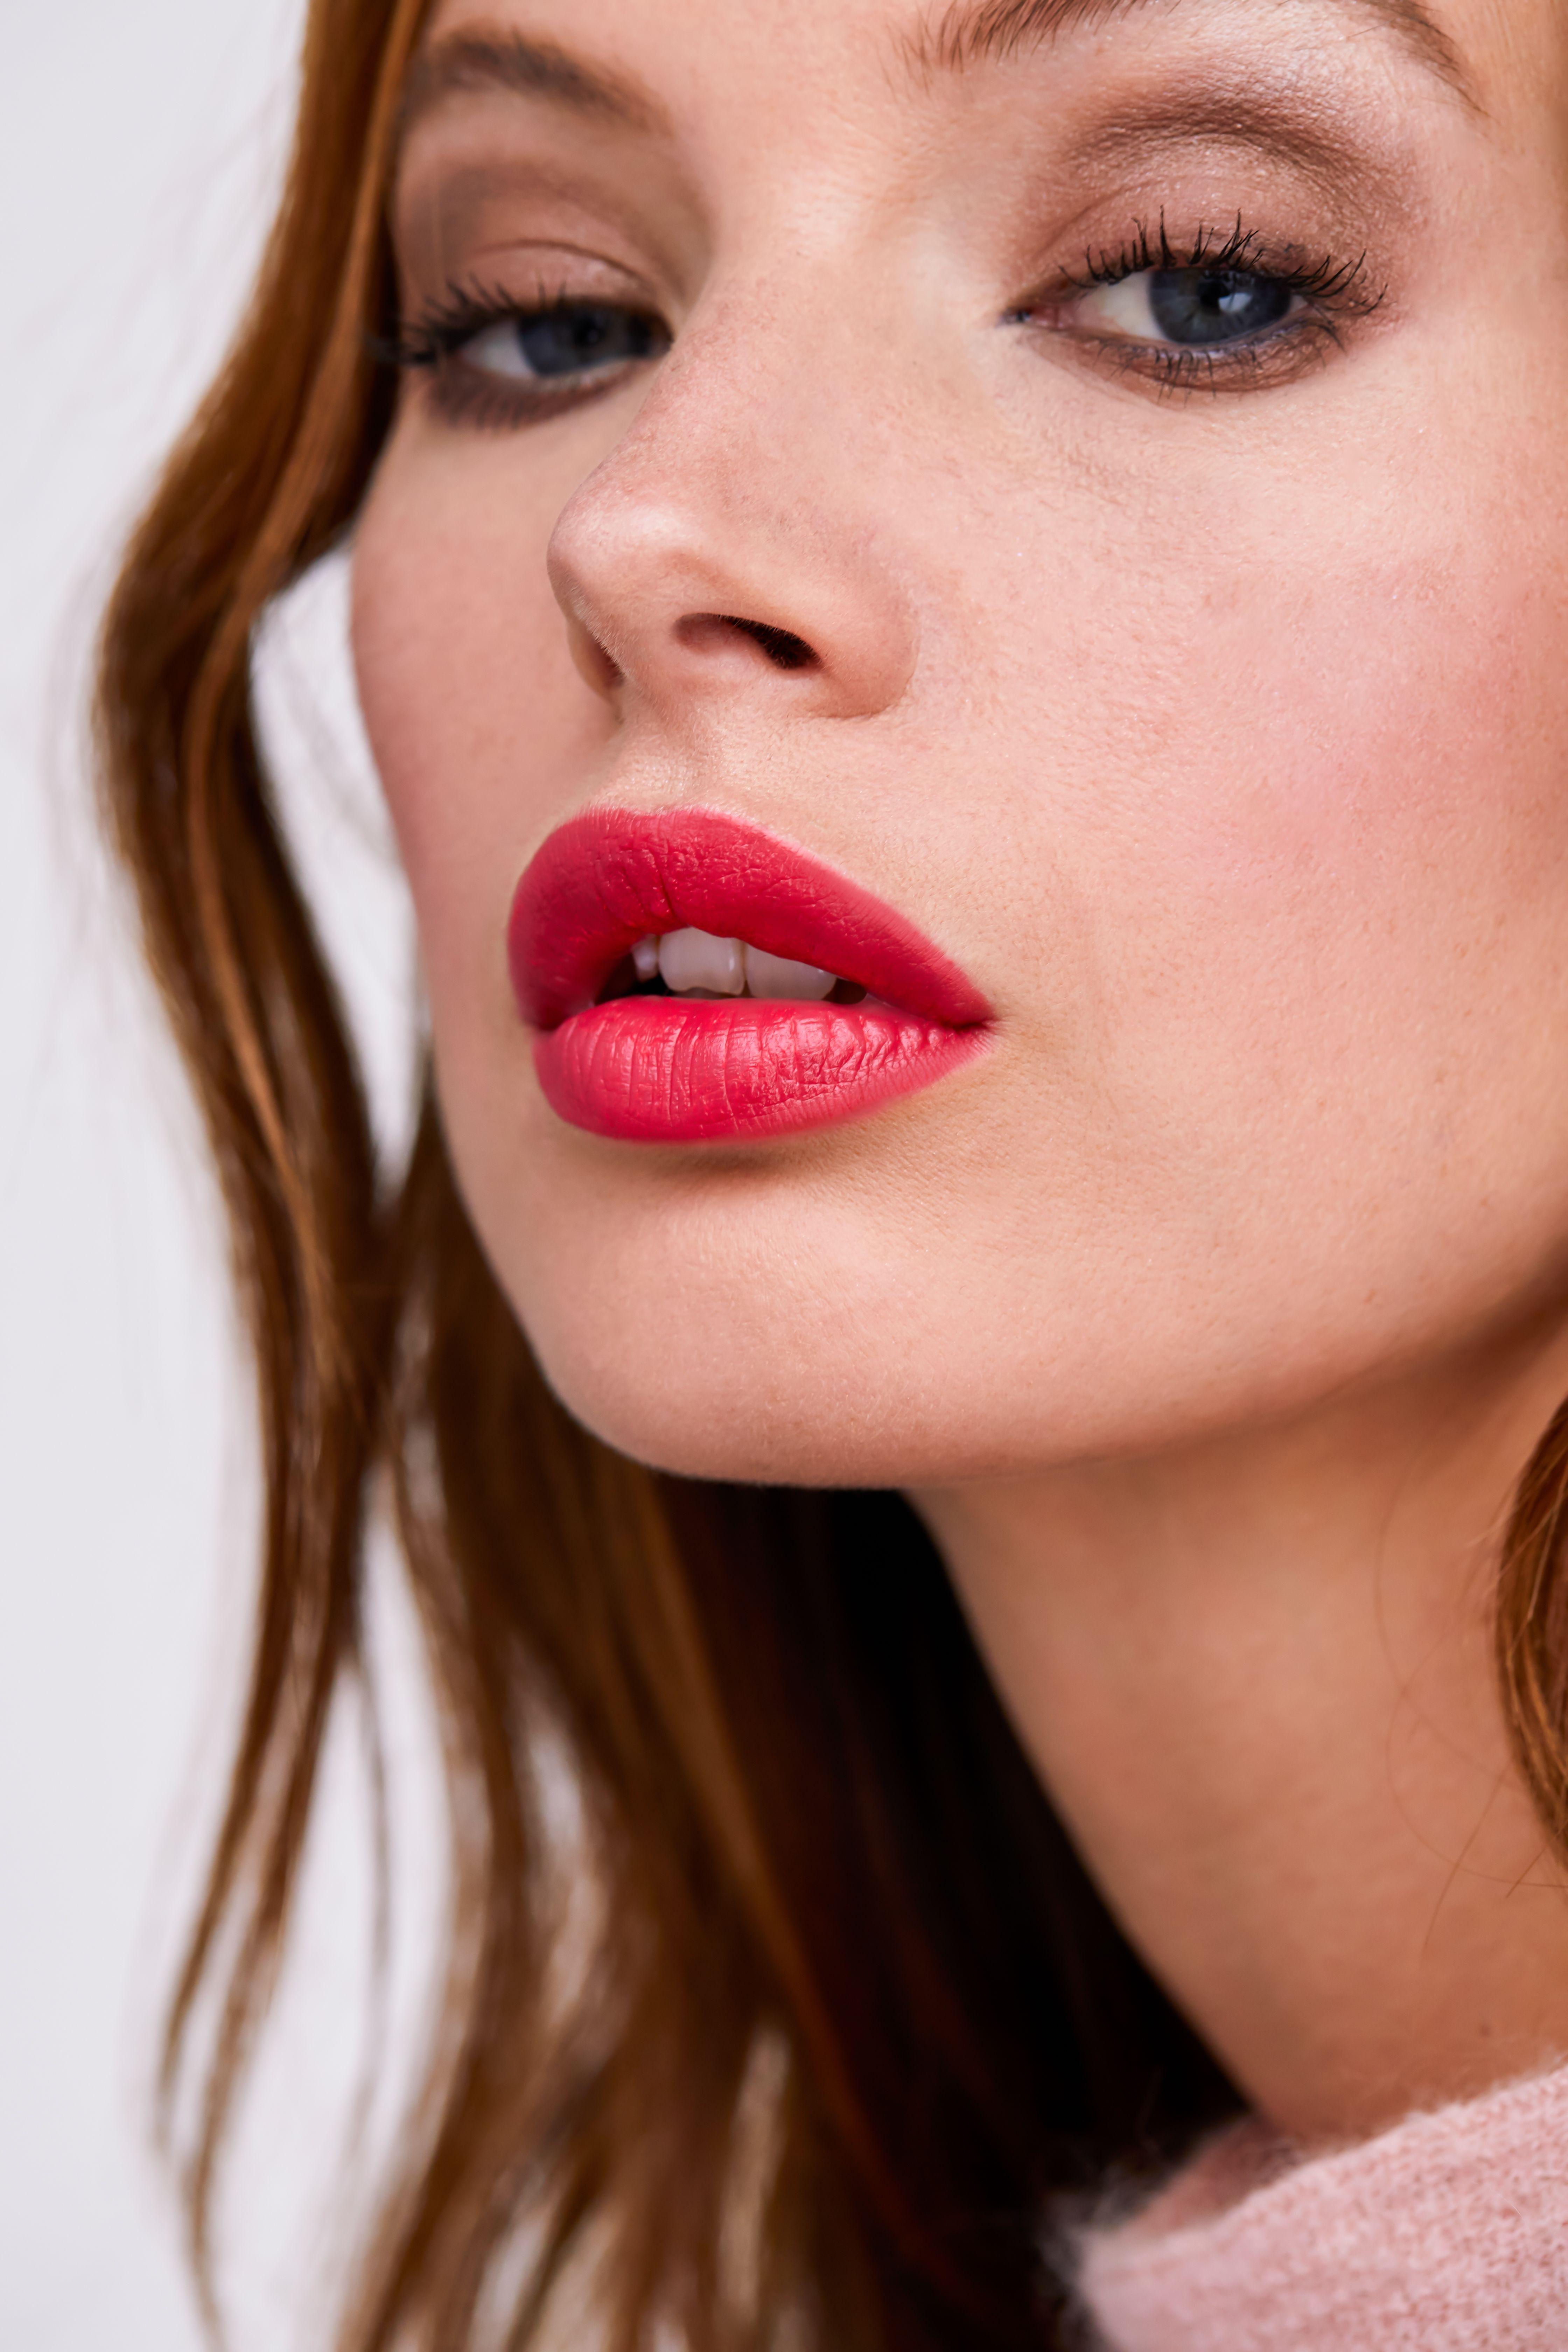 Mona wears Lip Vibes in Be Fearless Lips, Best makeup